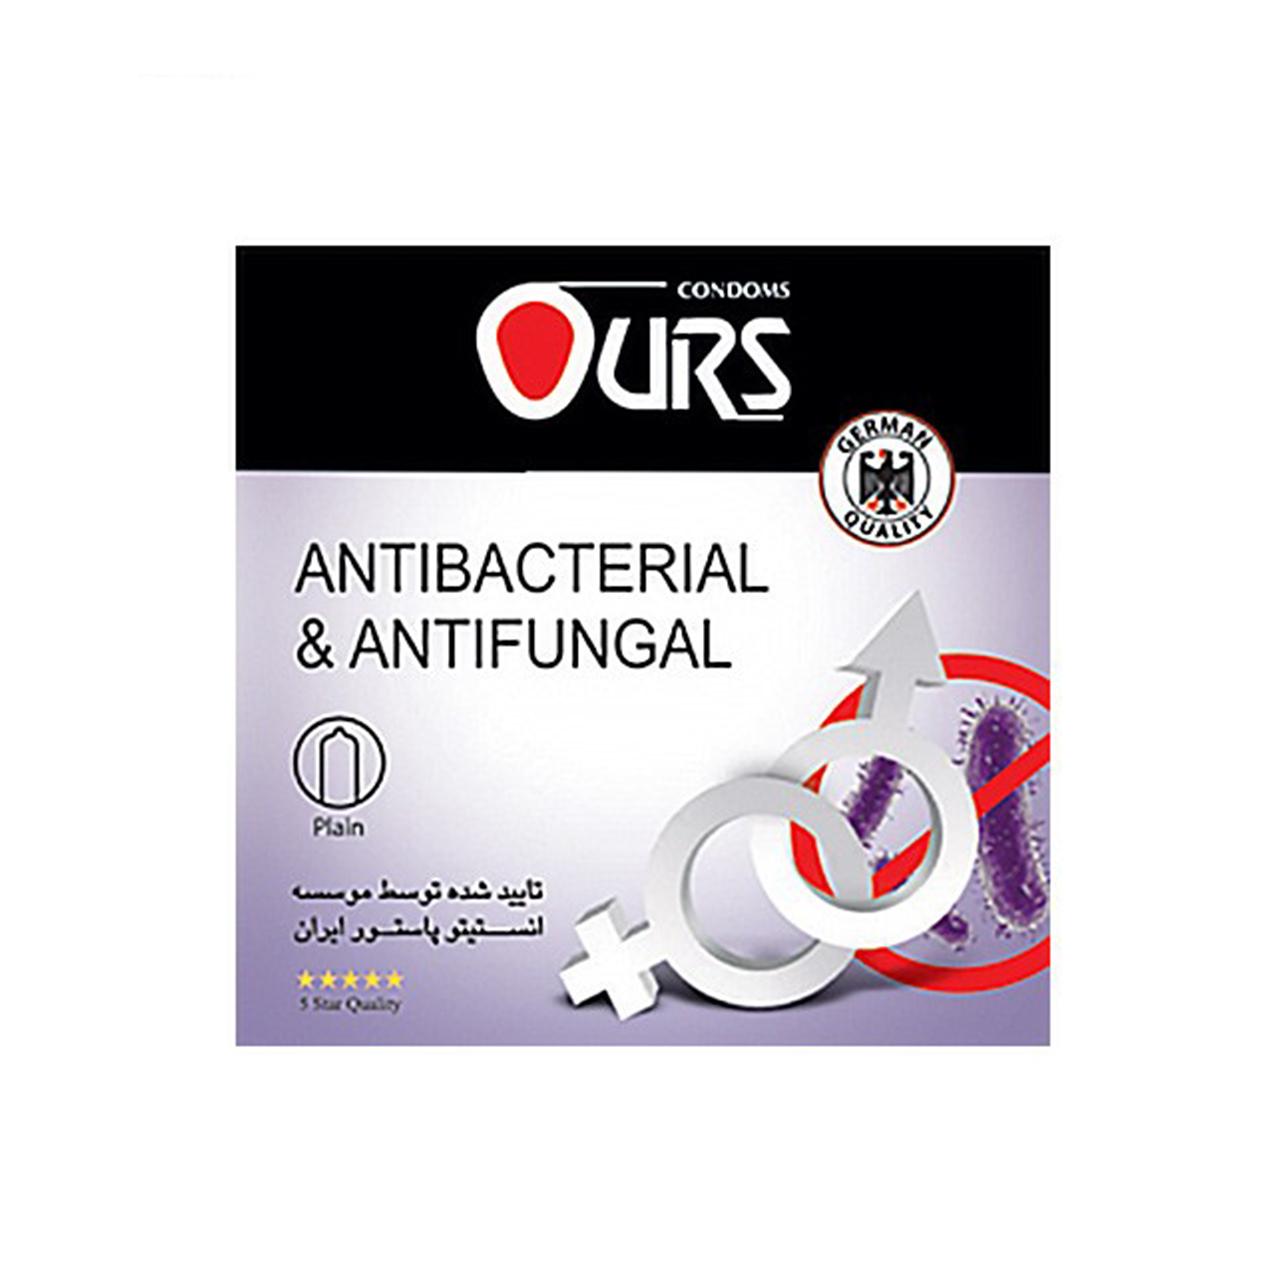 کاندوم اورز مدل Antibacterial And Antifungal بسته 3 عددی